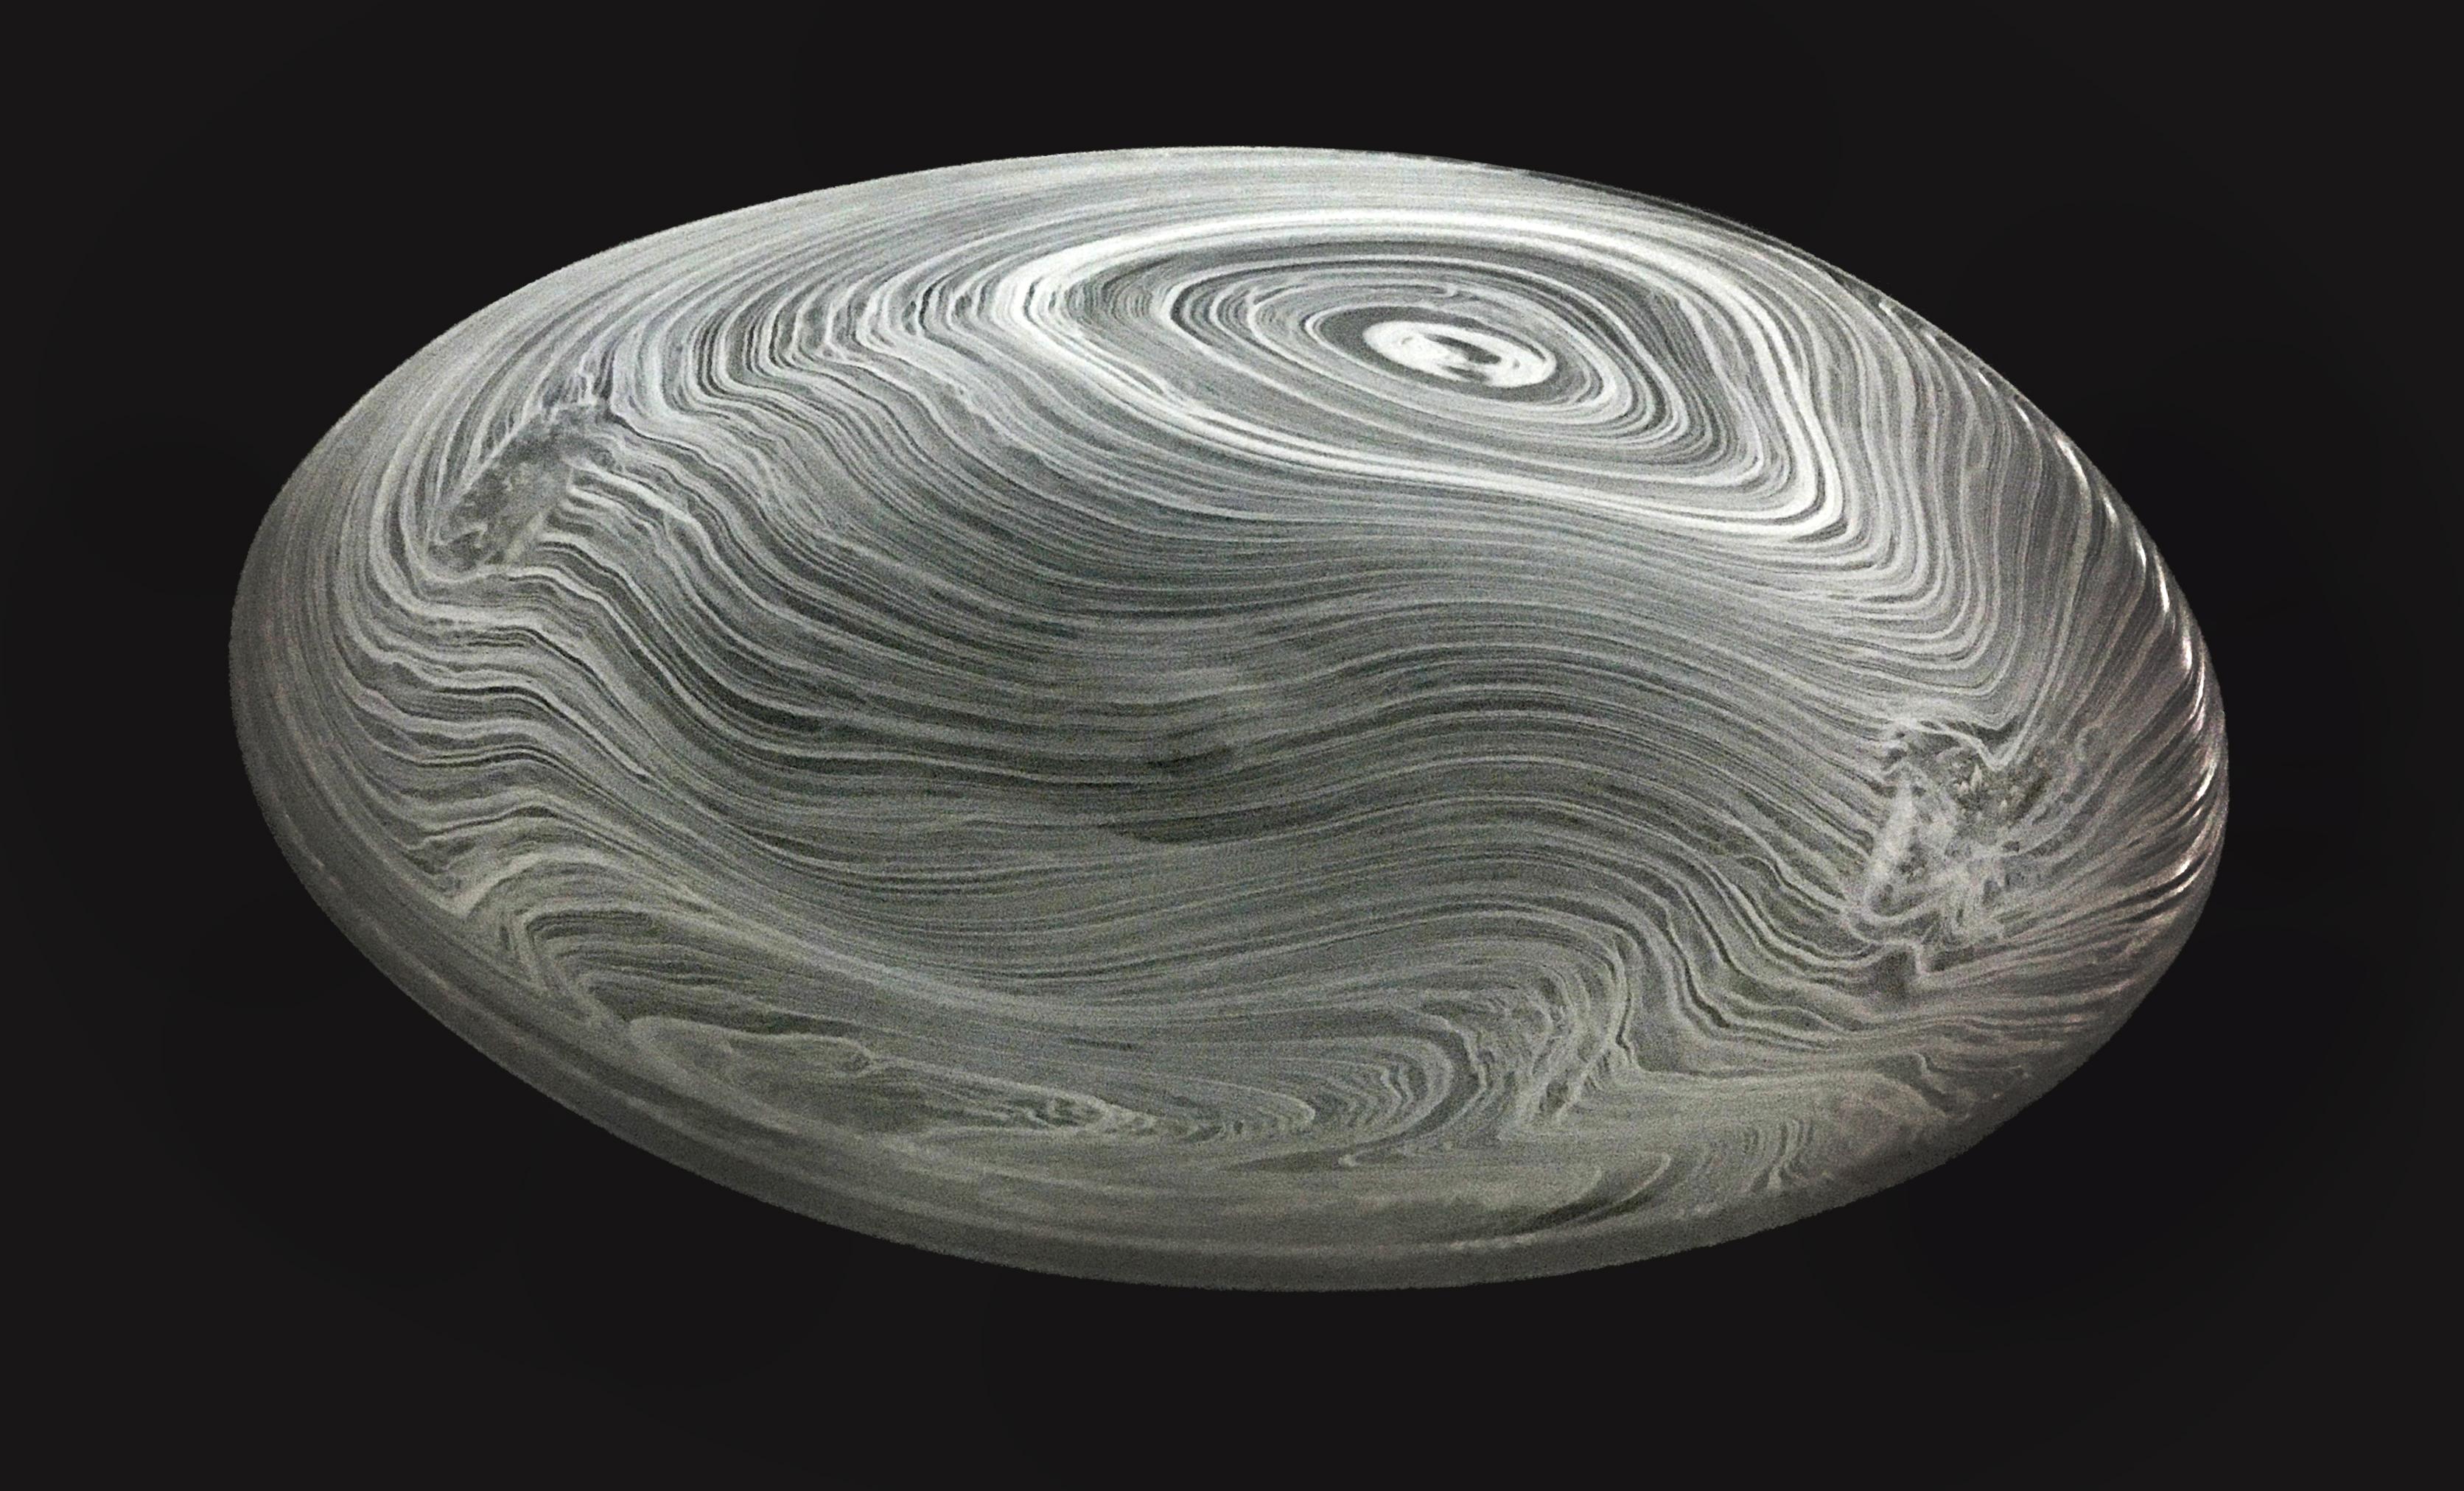 Zivania in Lefkara Plate